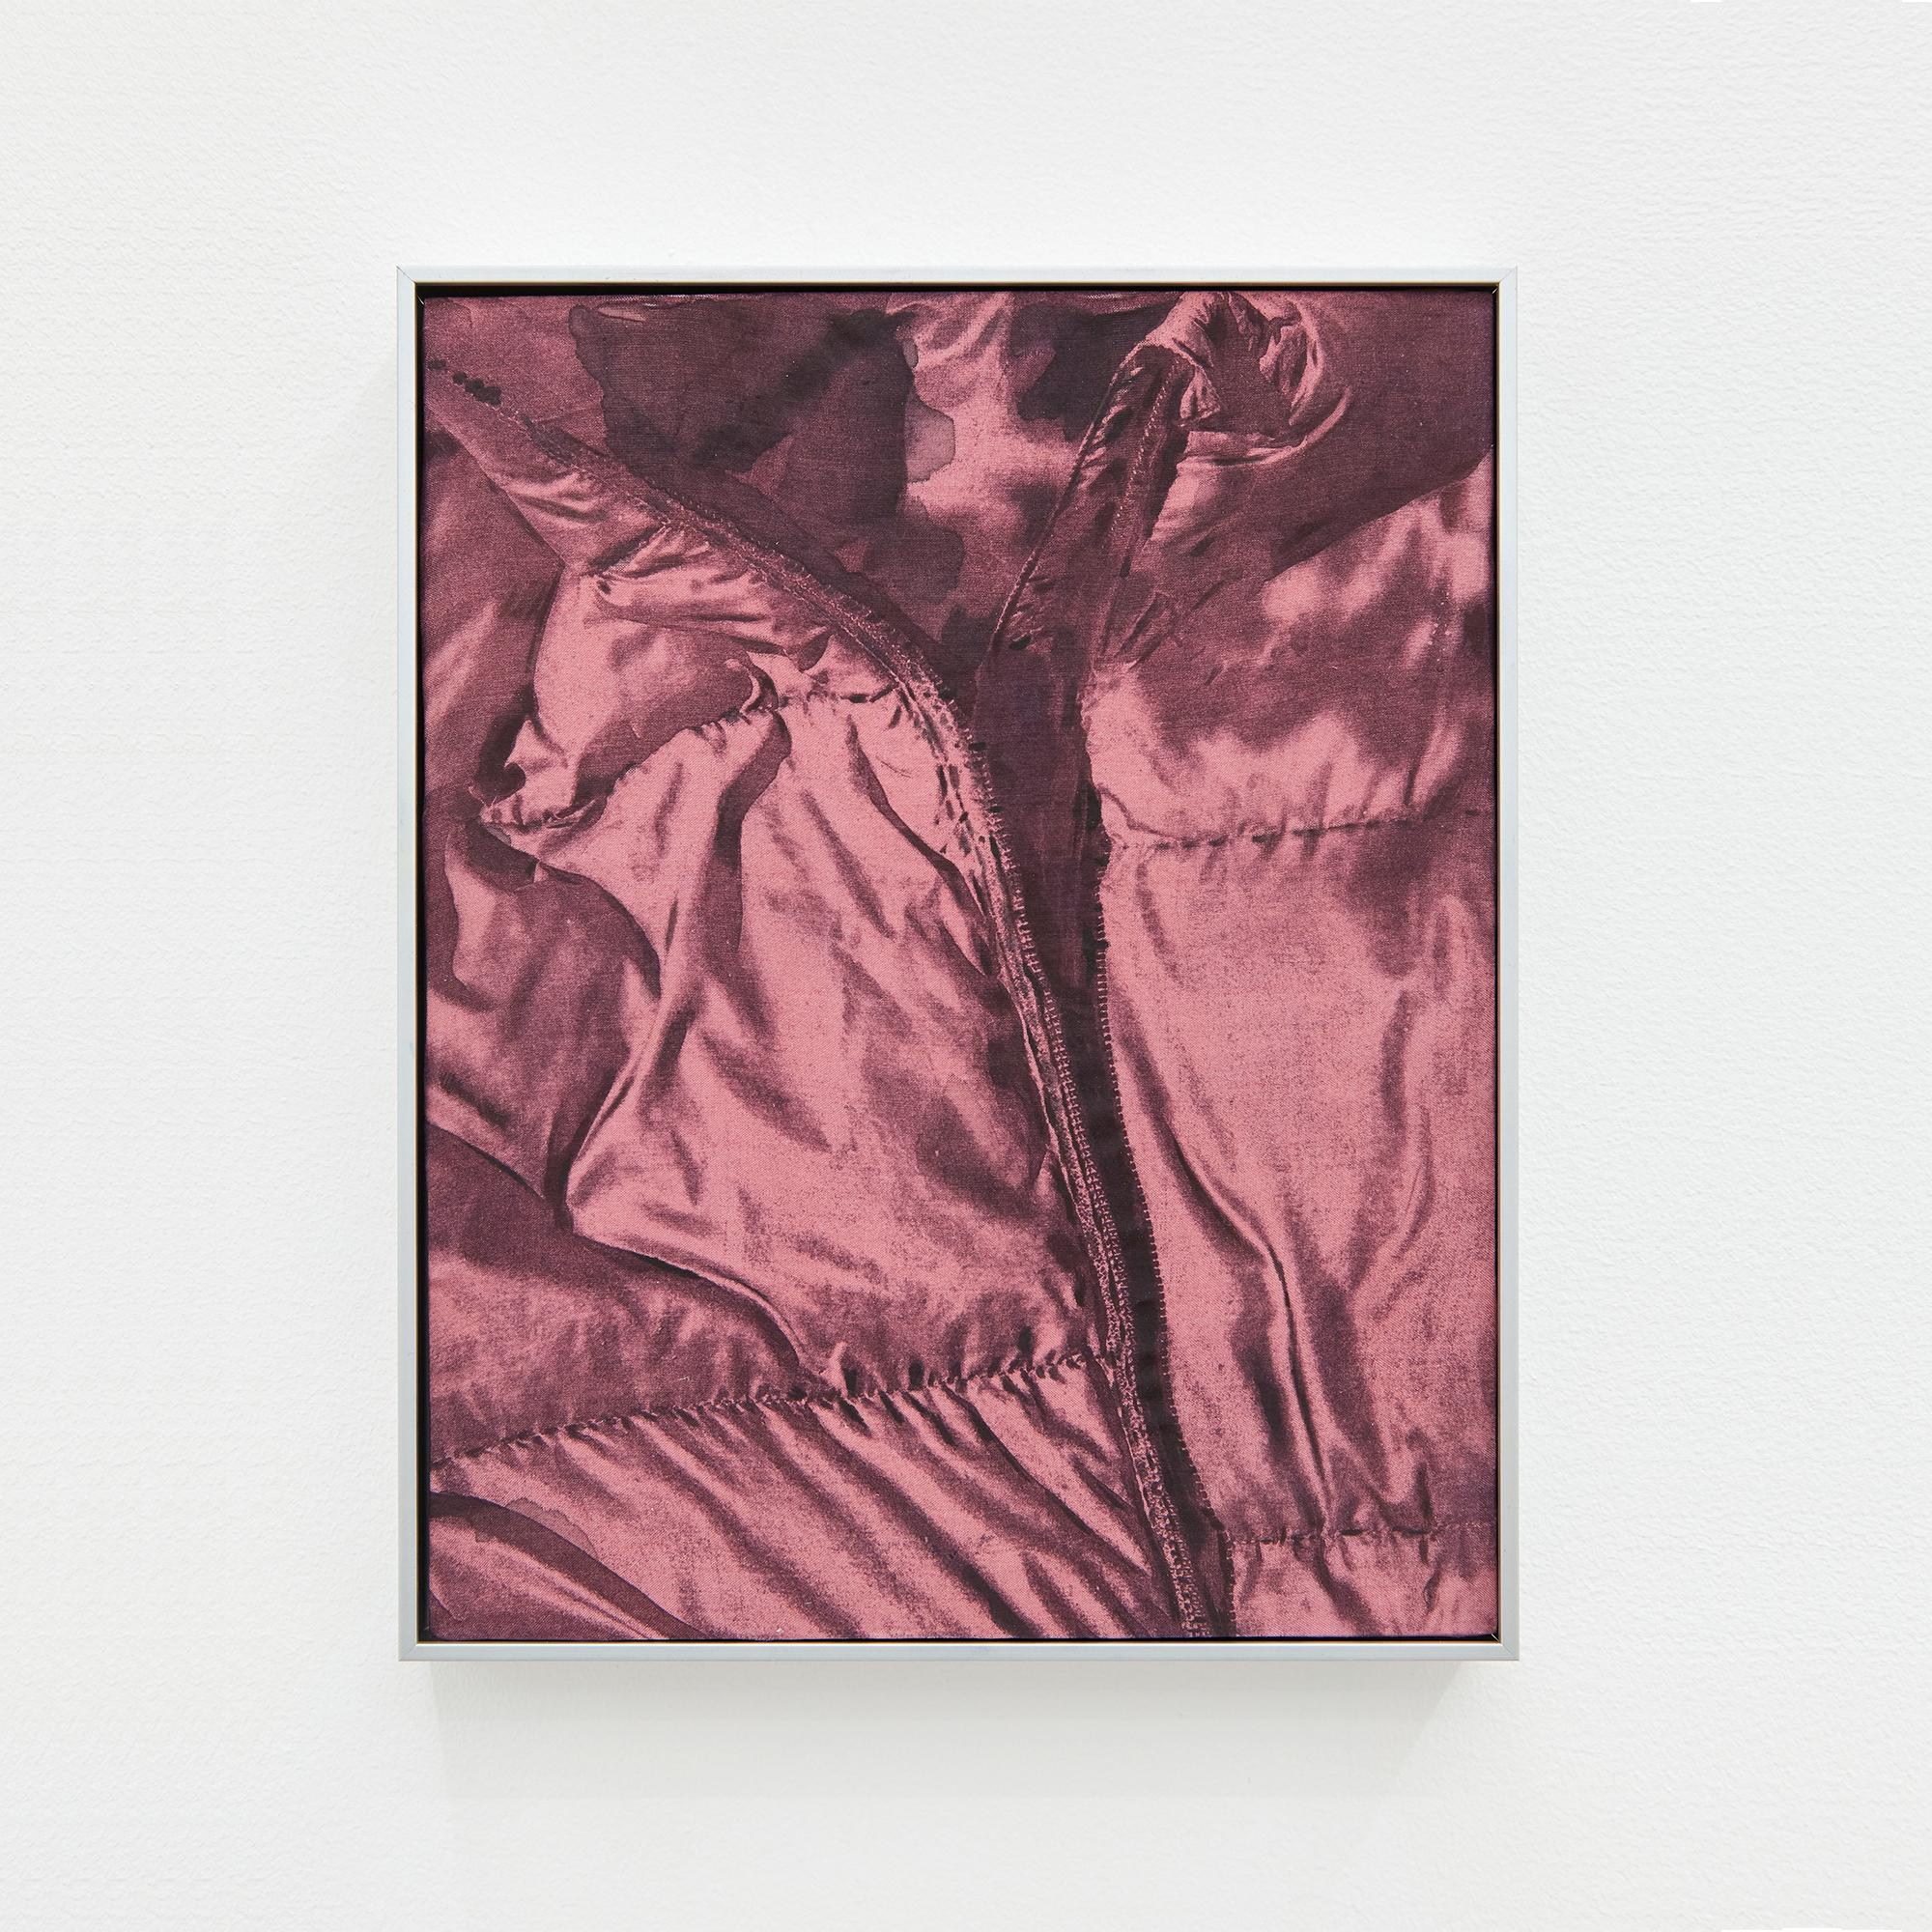 Warm/Wild, 2021. Oil and watercolour on dyed silk, aluminium frame, 23 x 17 cm